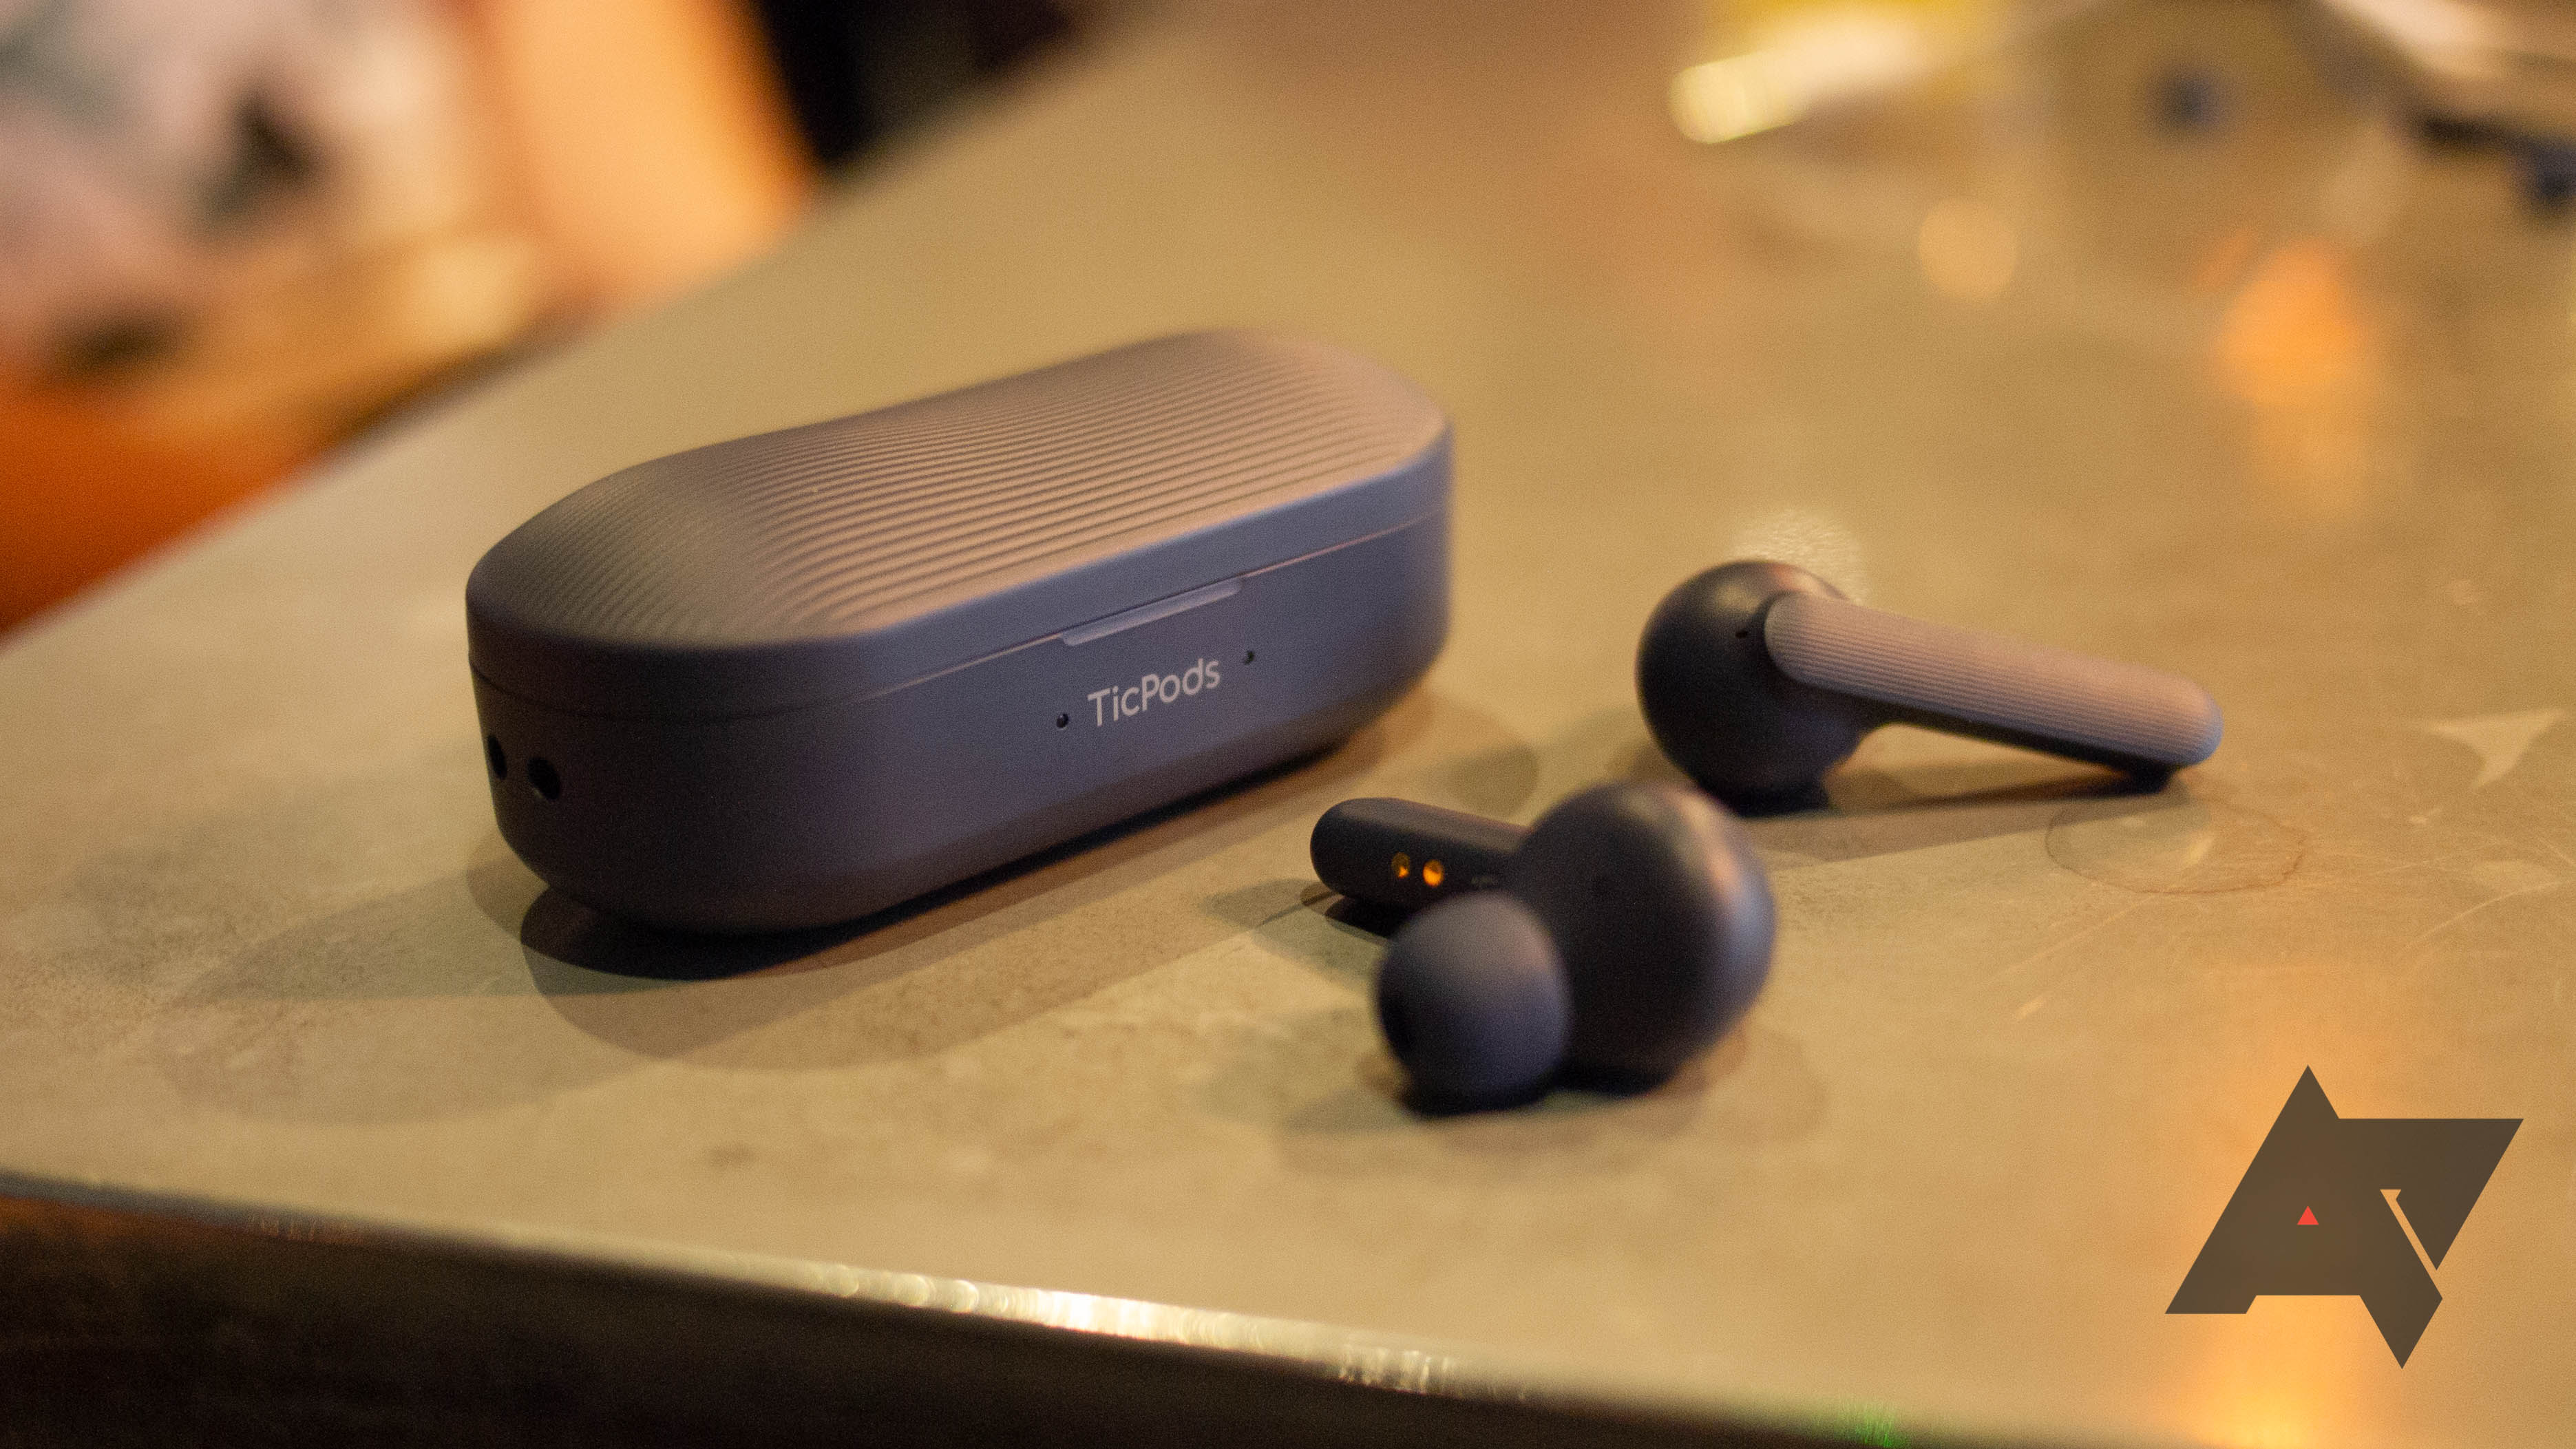 Mobvoi Ticpods Free True Wireless Earbuds Down To 80 50 Off